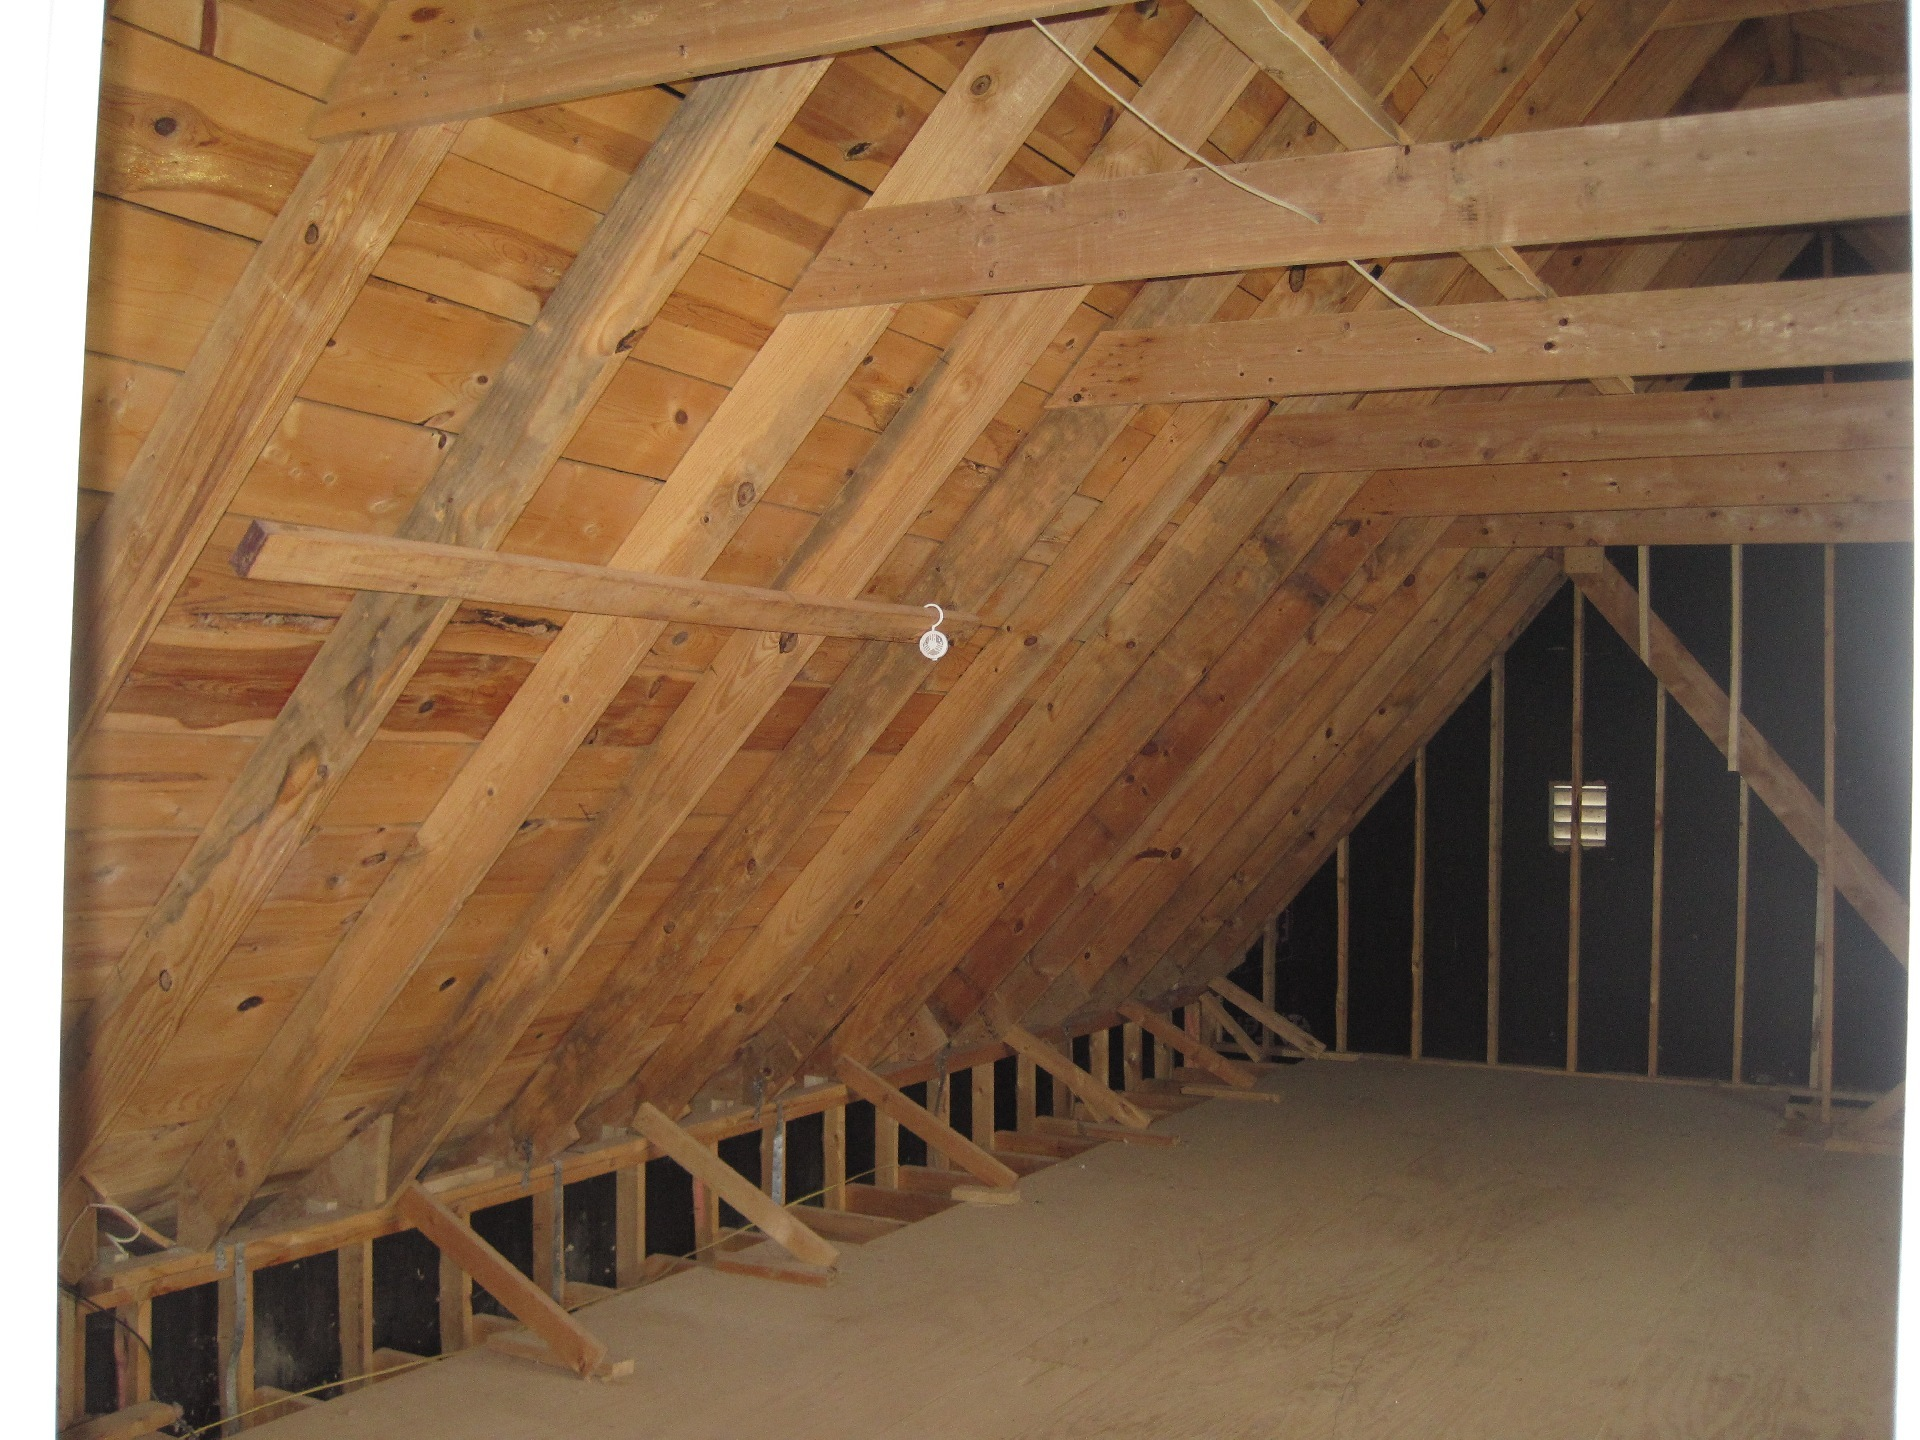 attic buildout ideas - amp74 s Home Theater Gallery Attic Buildout Theater 105